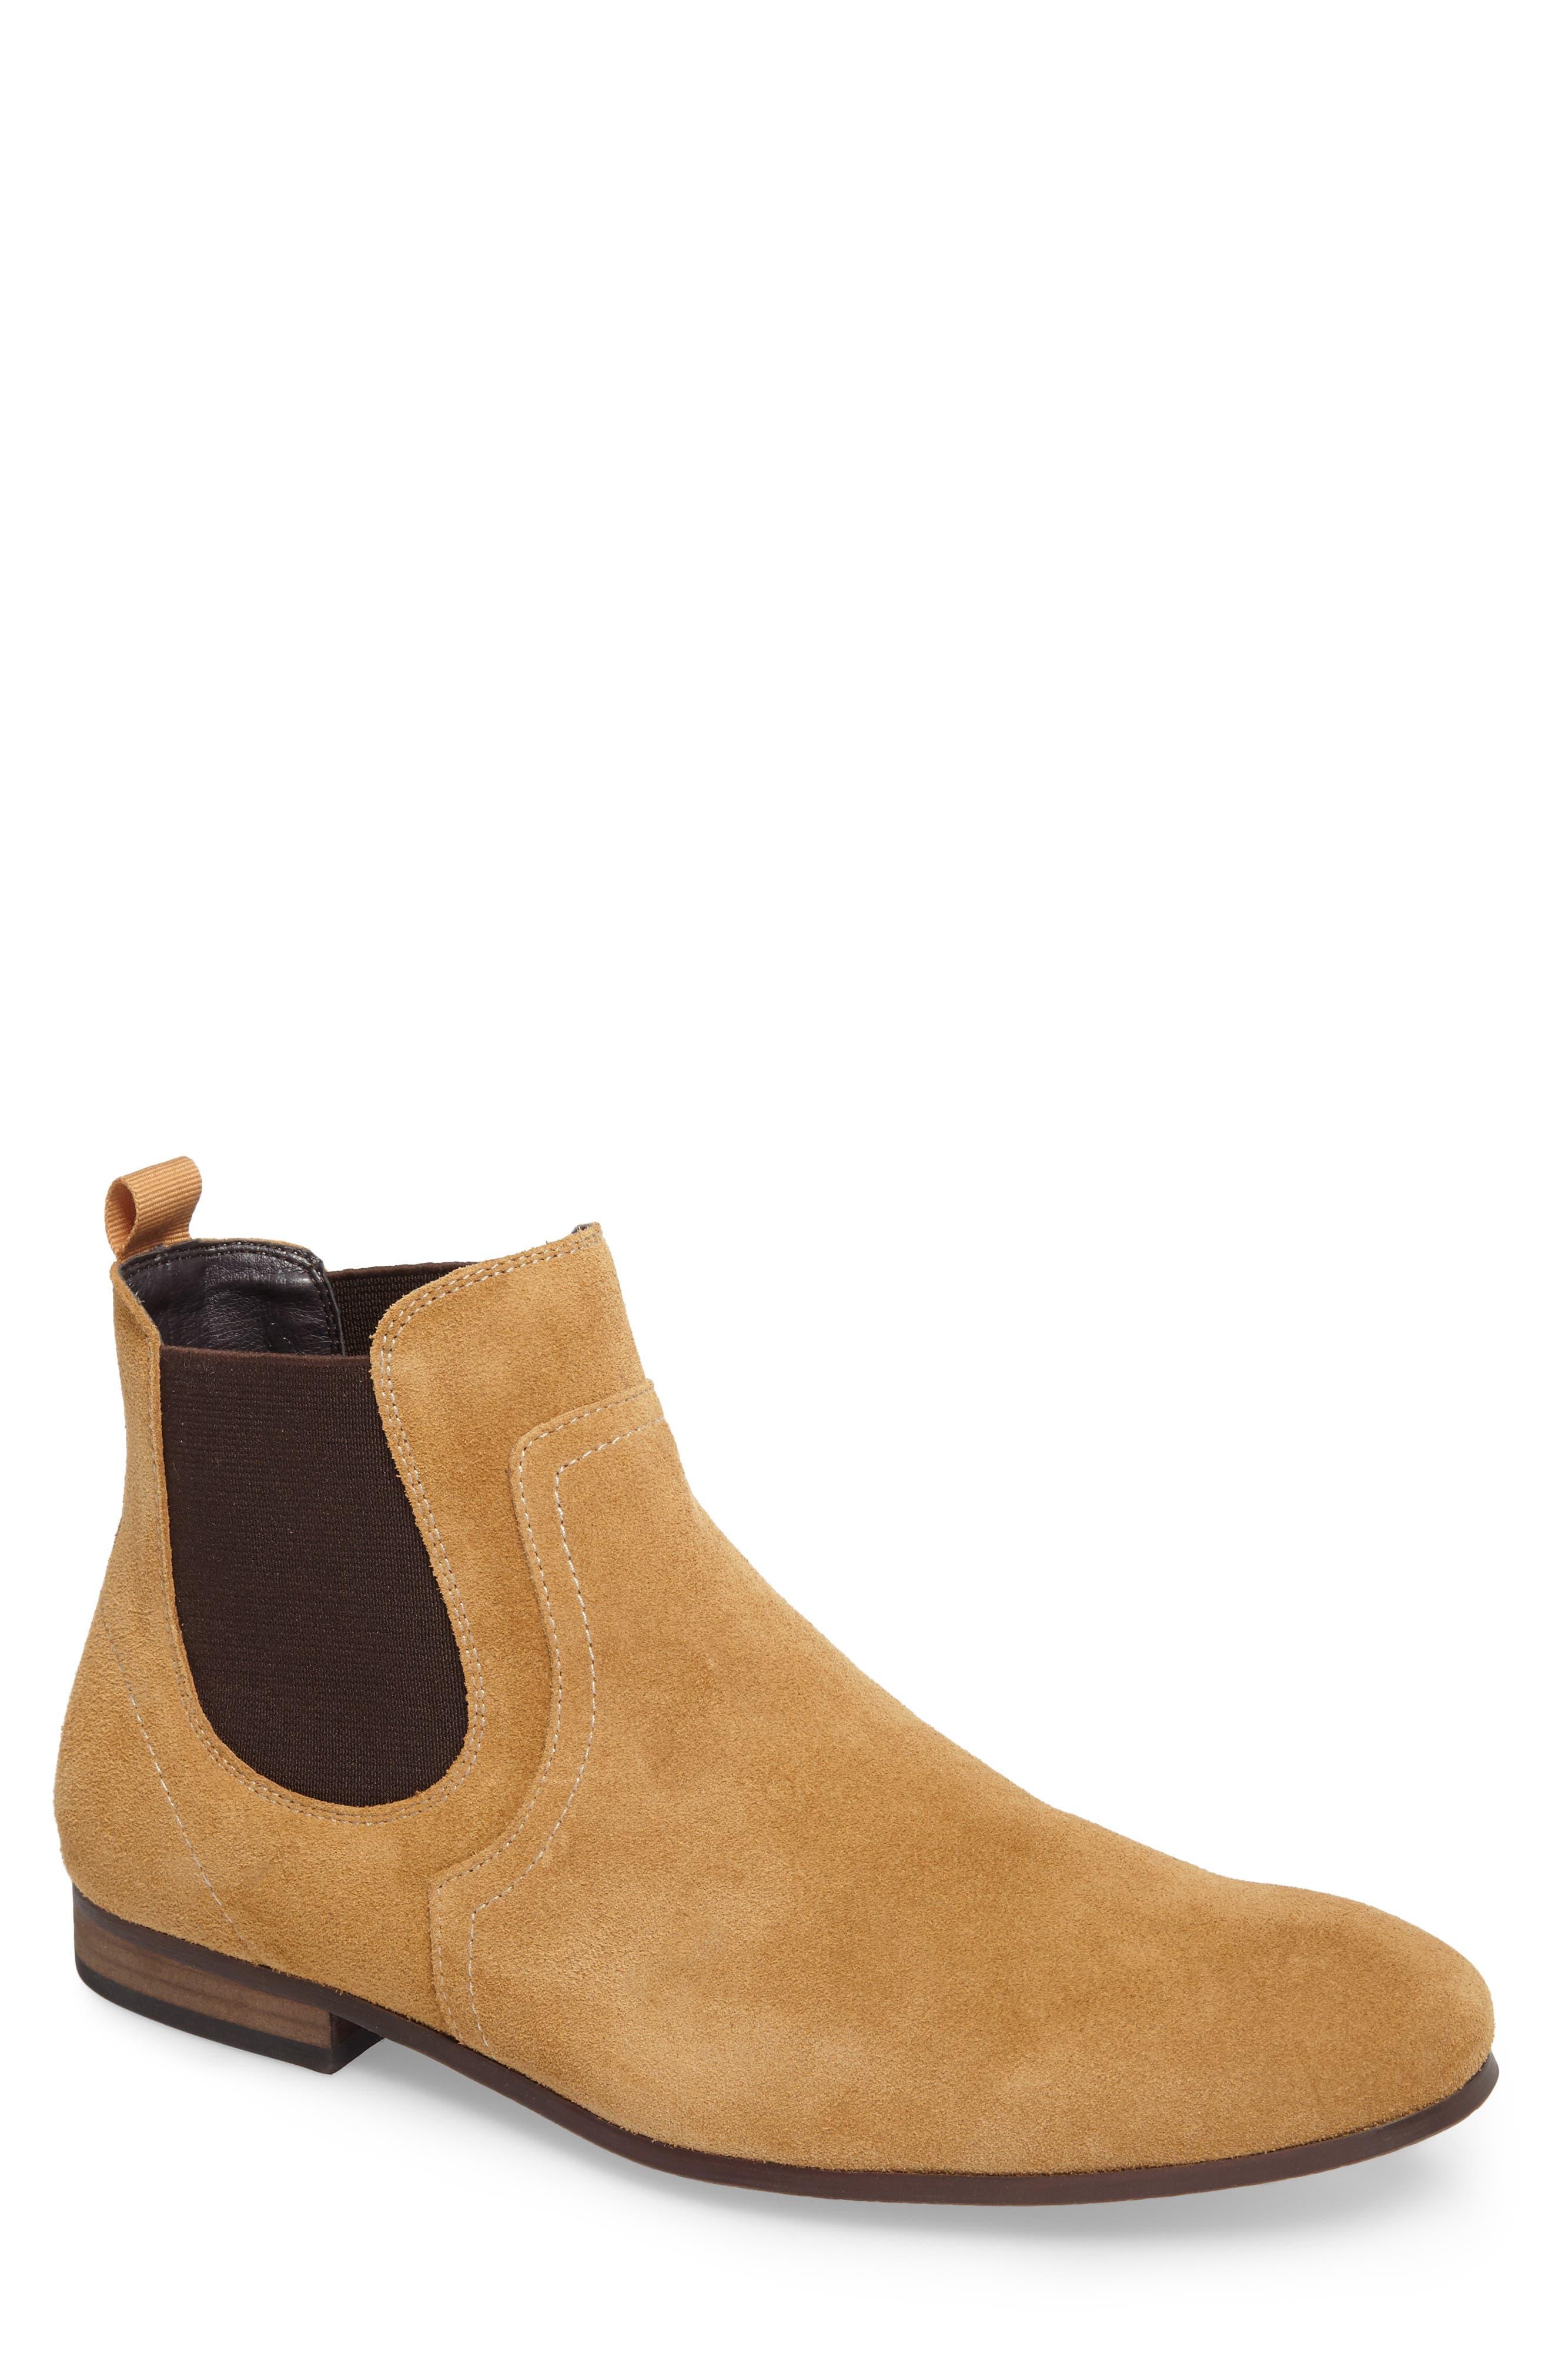 Main Image - The Rail Brysen Chelsea Boot (Men)